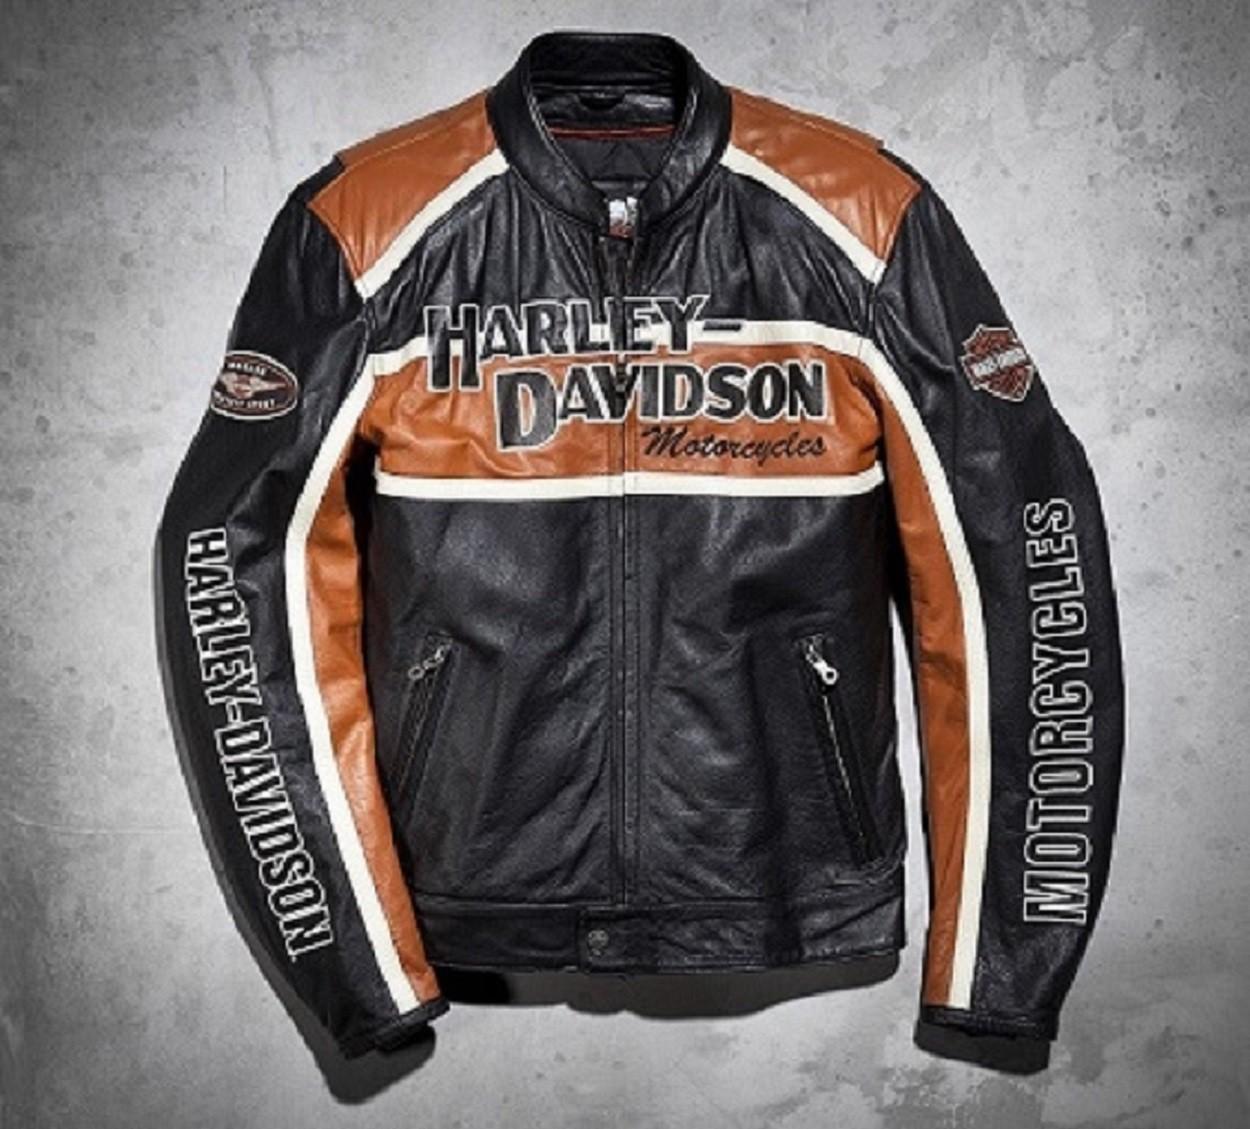 Harley Davidson Classic Cruiser 98118-08VM Leather Jacket